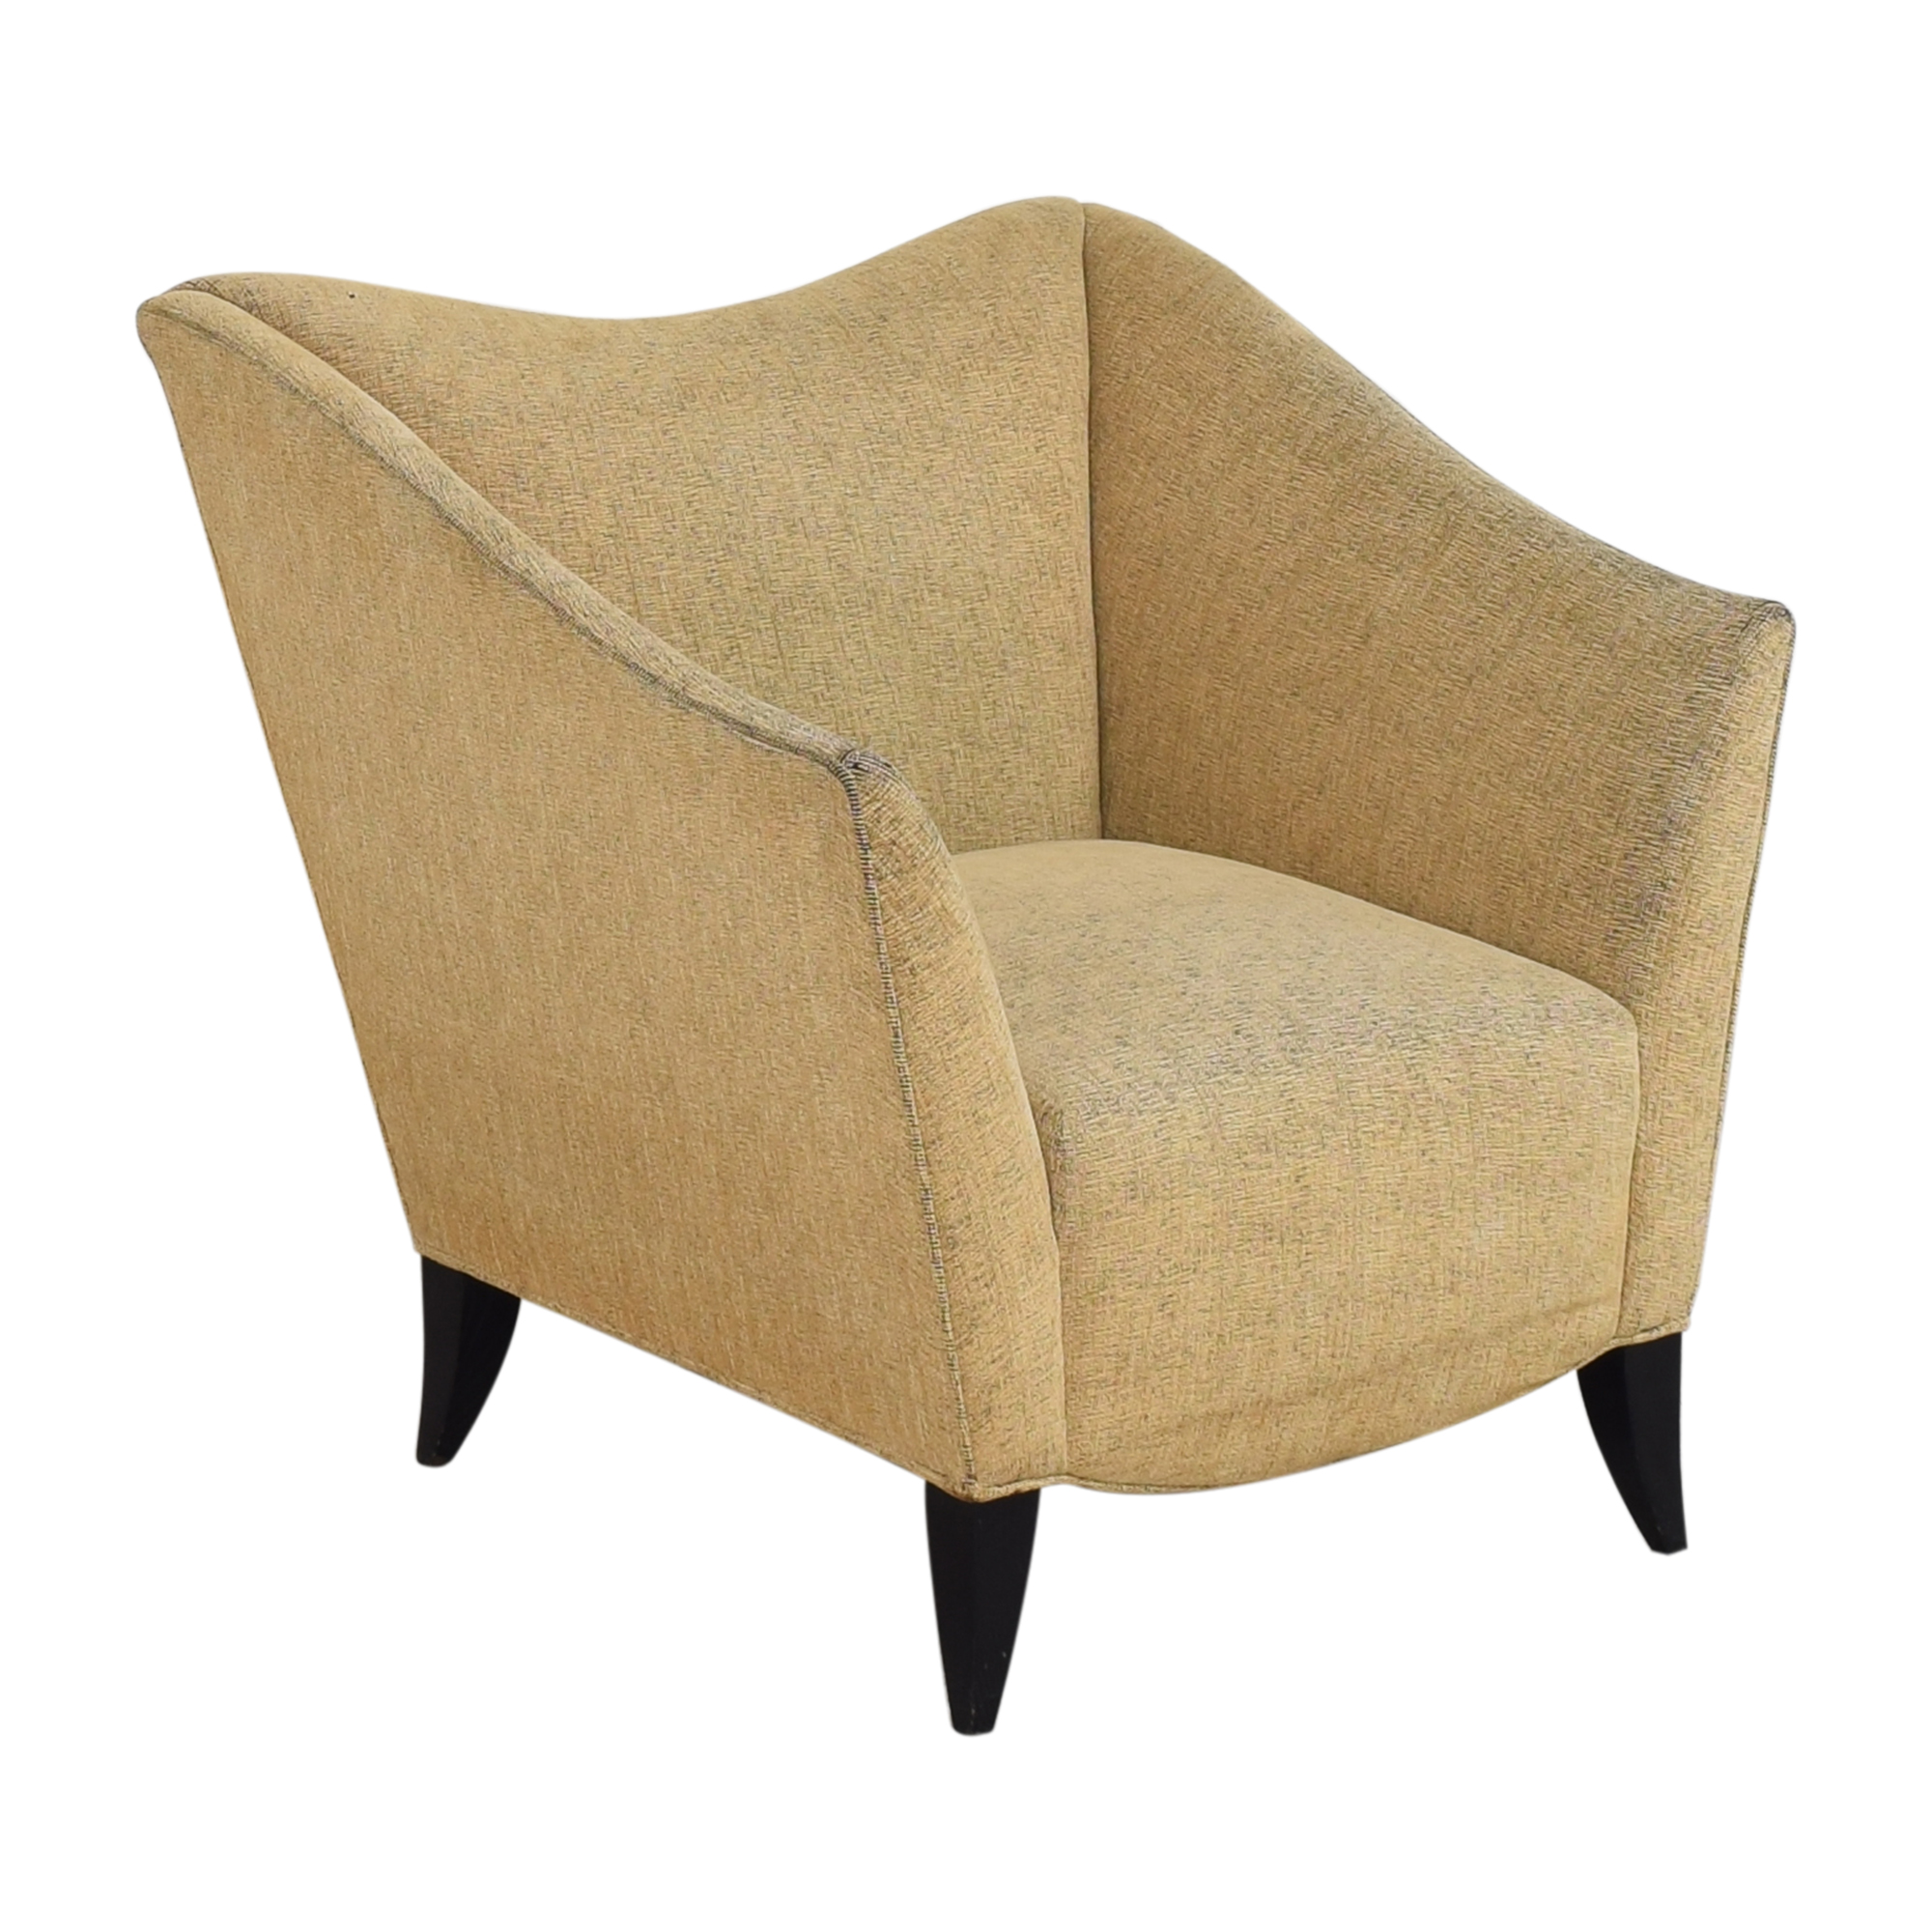 Swaim Swaim Accent Chair for sale